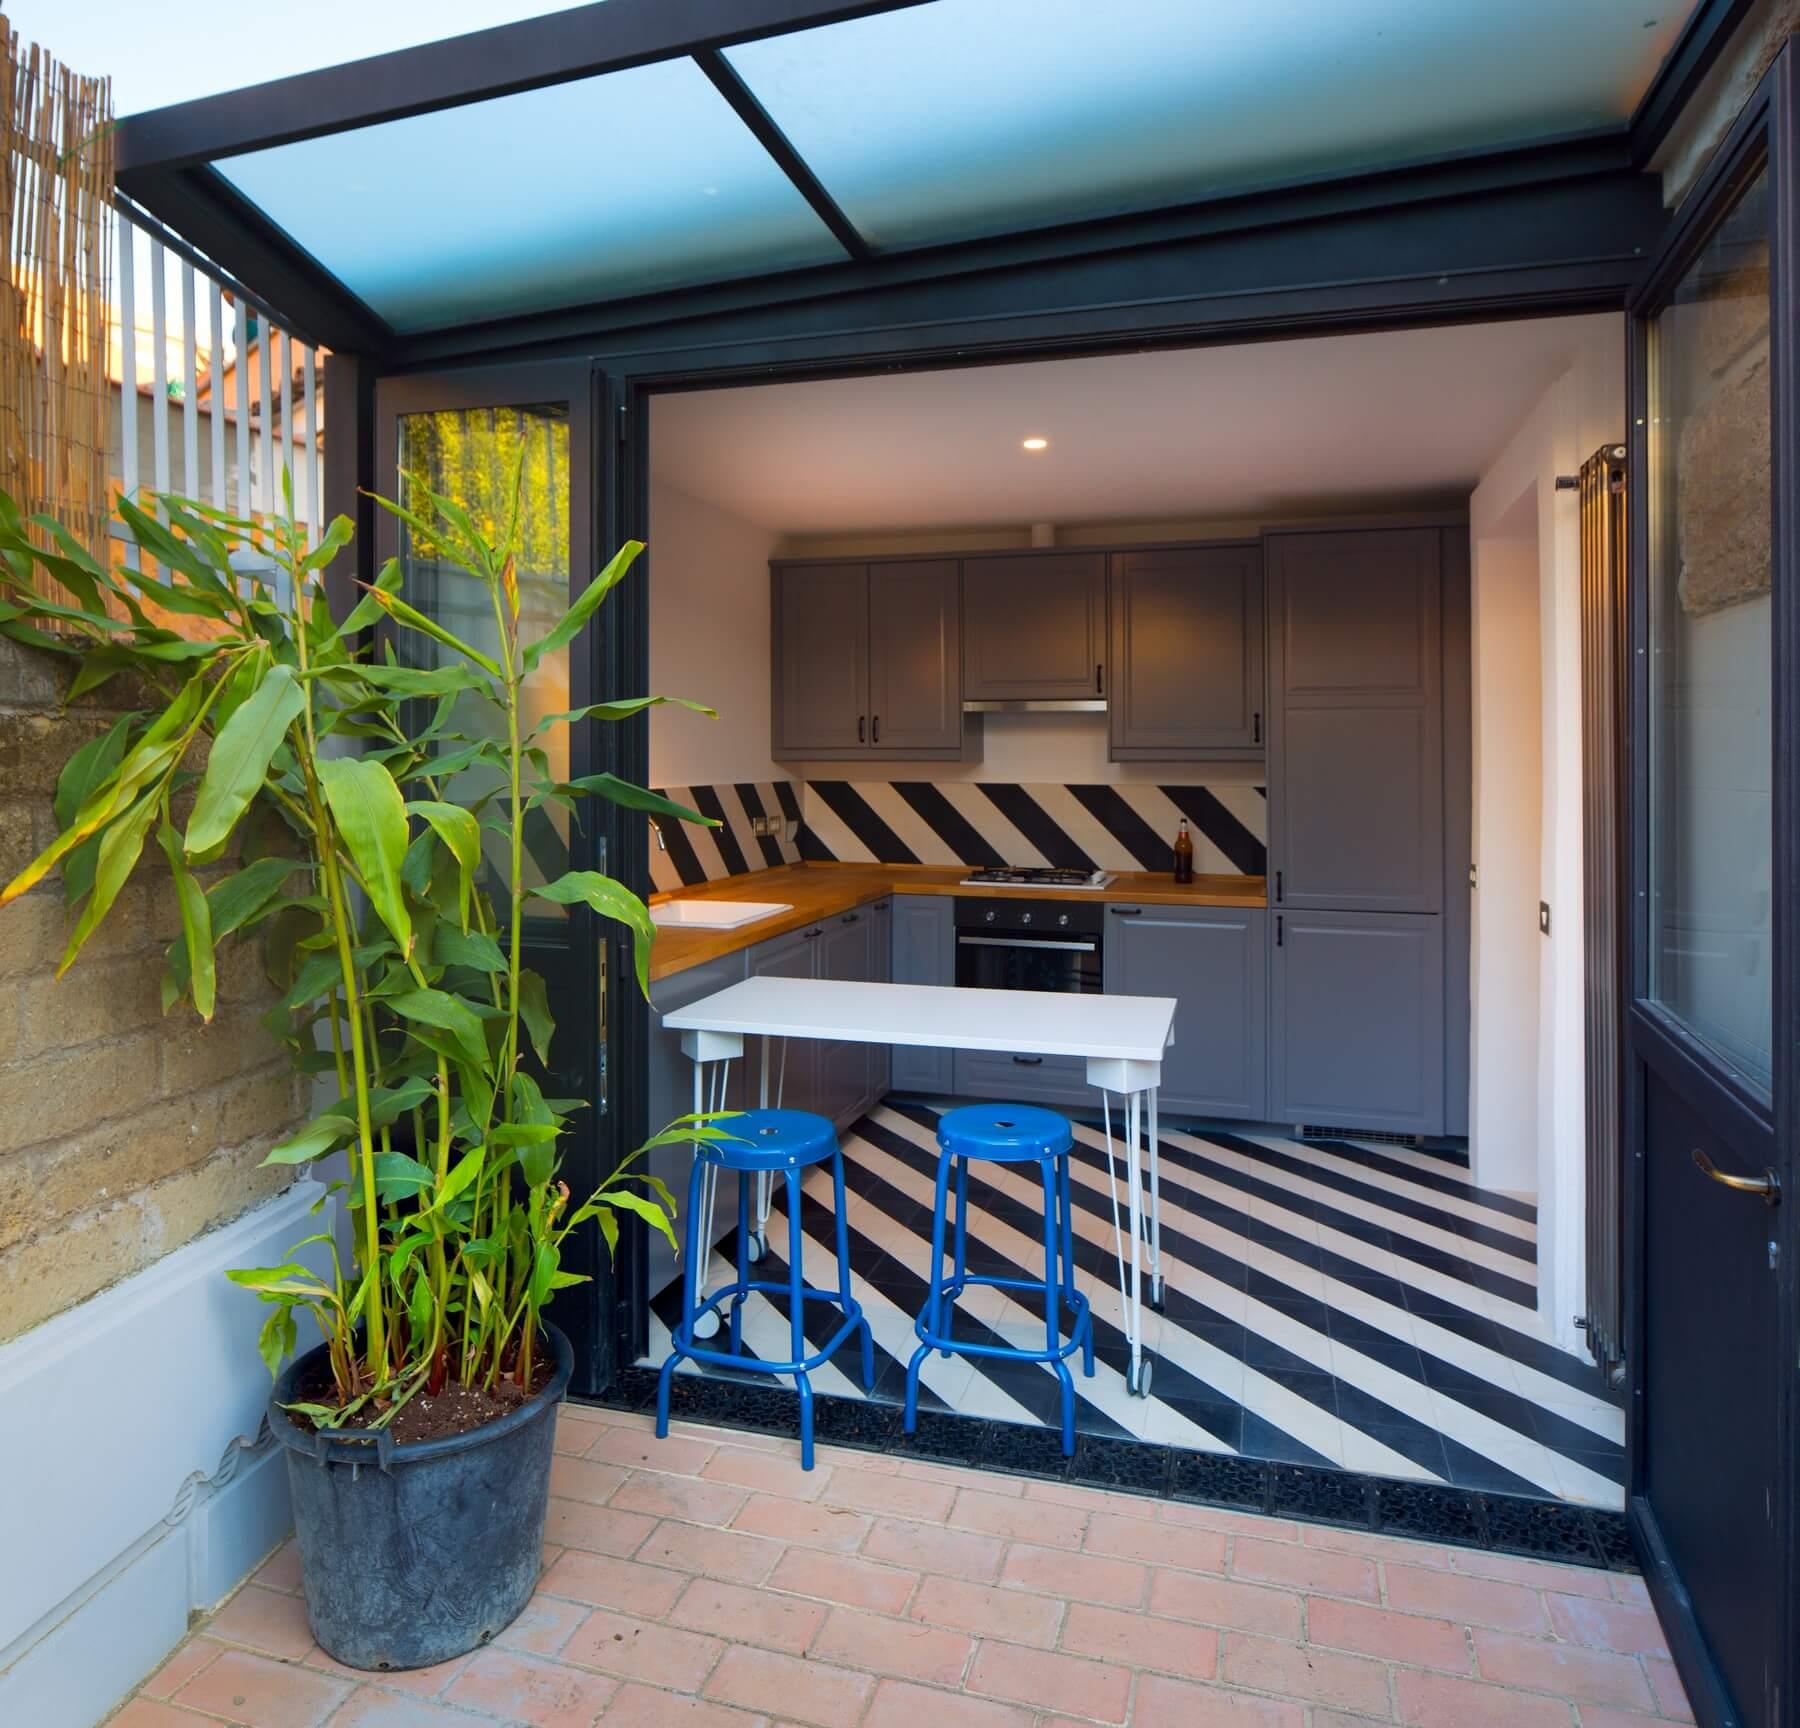 Appartamento san saba roma architetto morgantini 3 for Architetto giardini roma